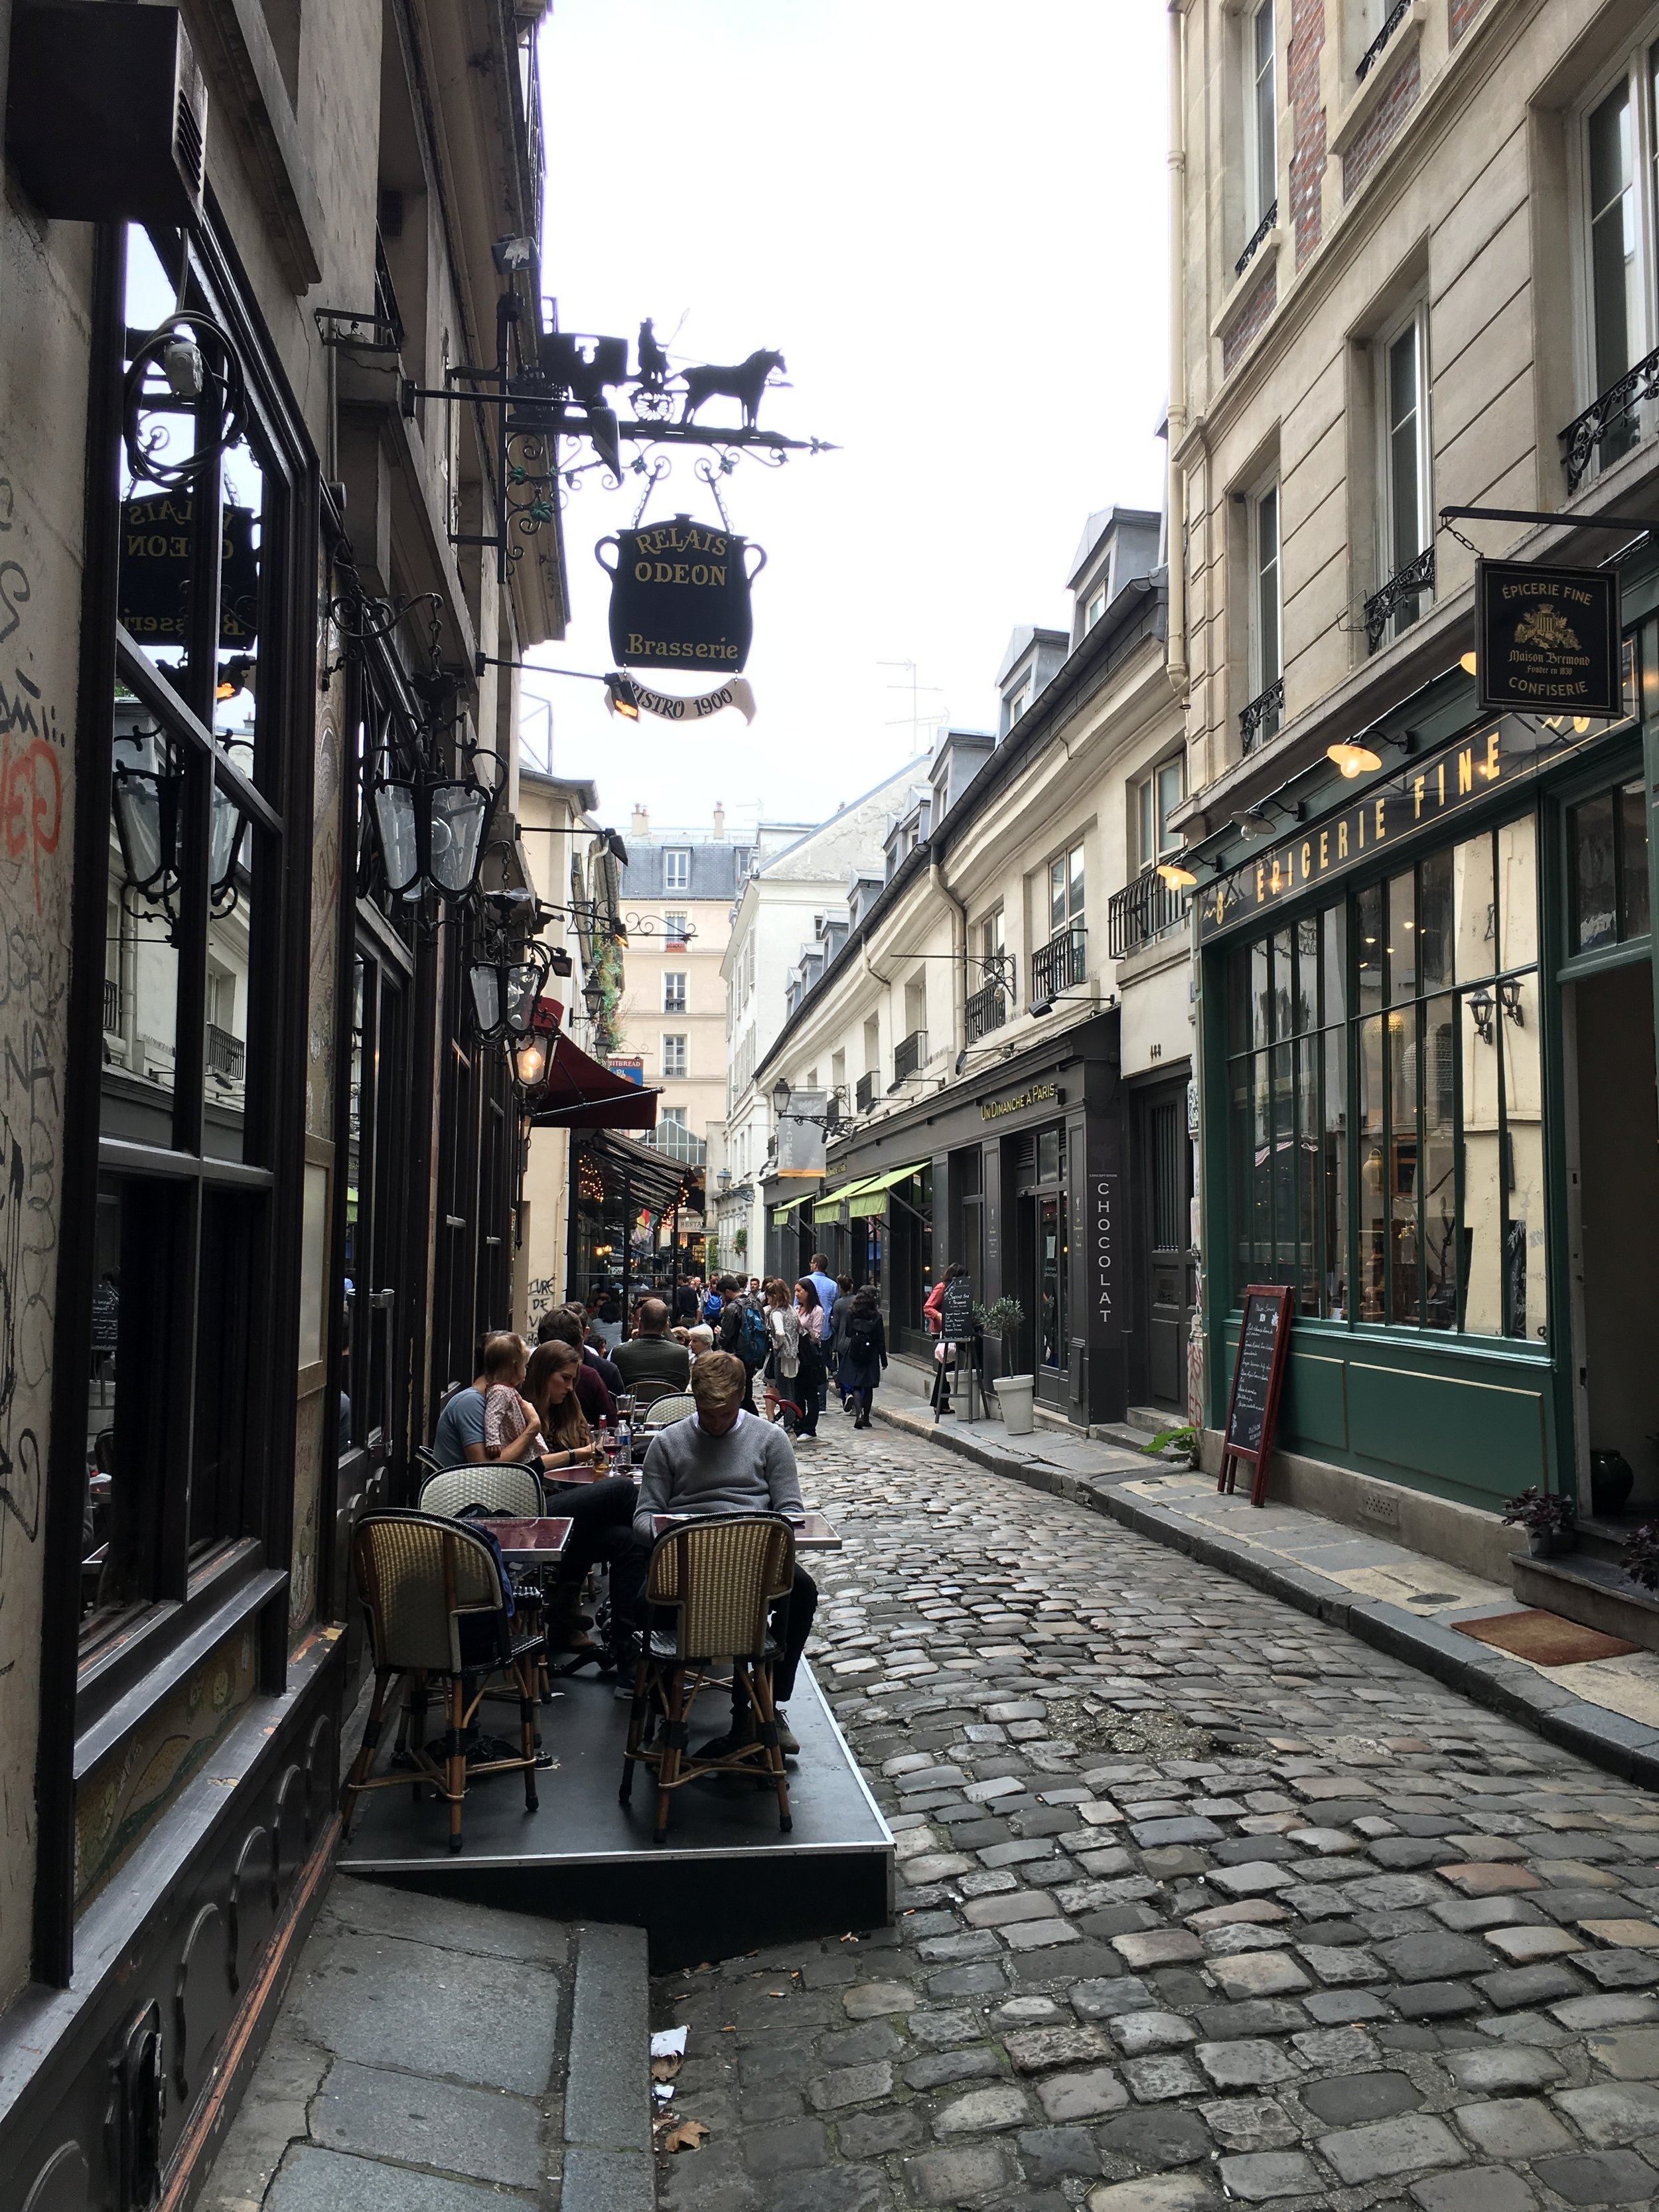 The best little alley way